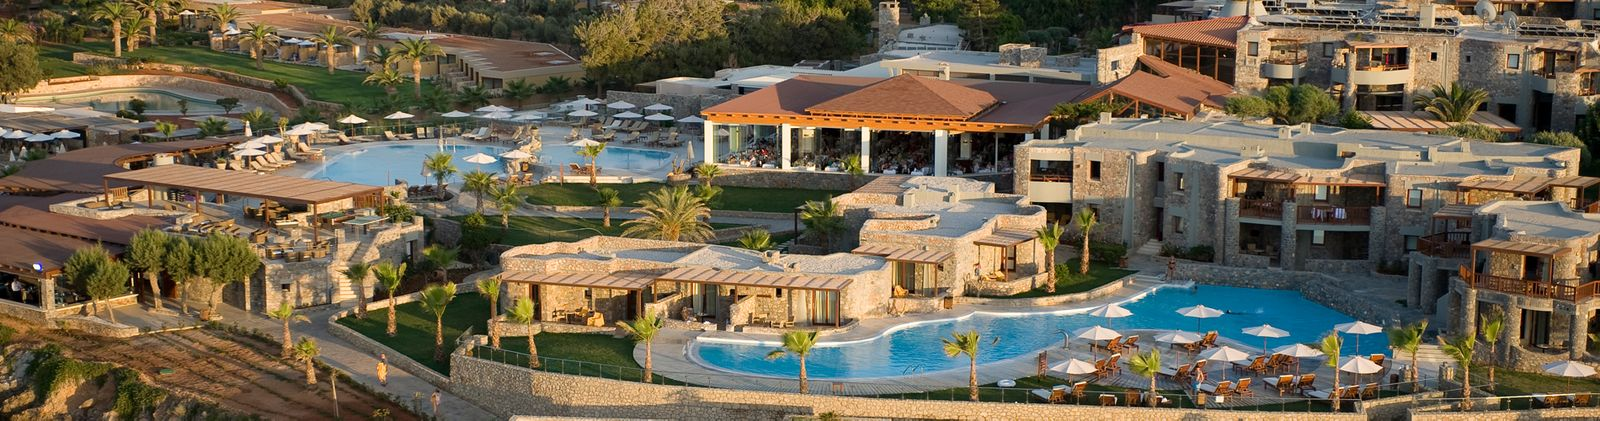 Hotel Ikaros Beach Resort Spa